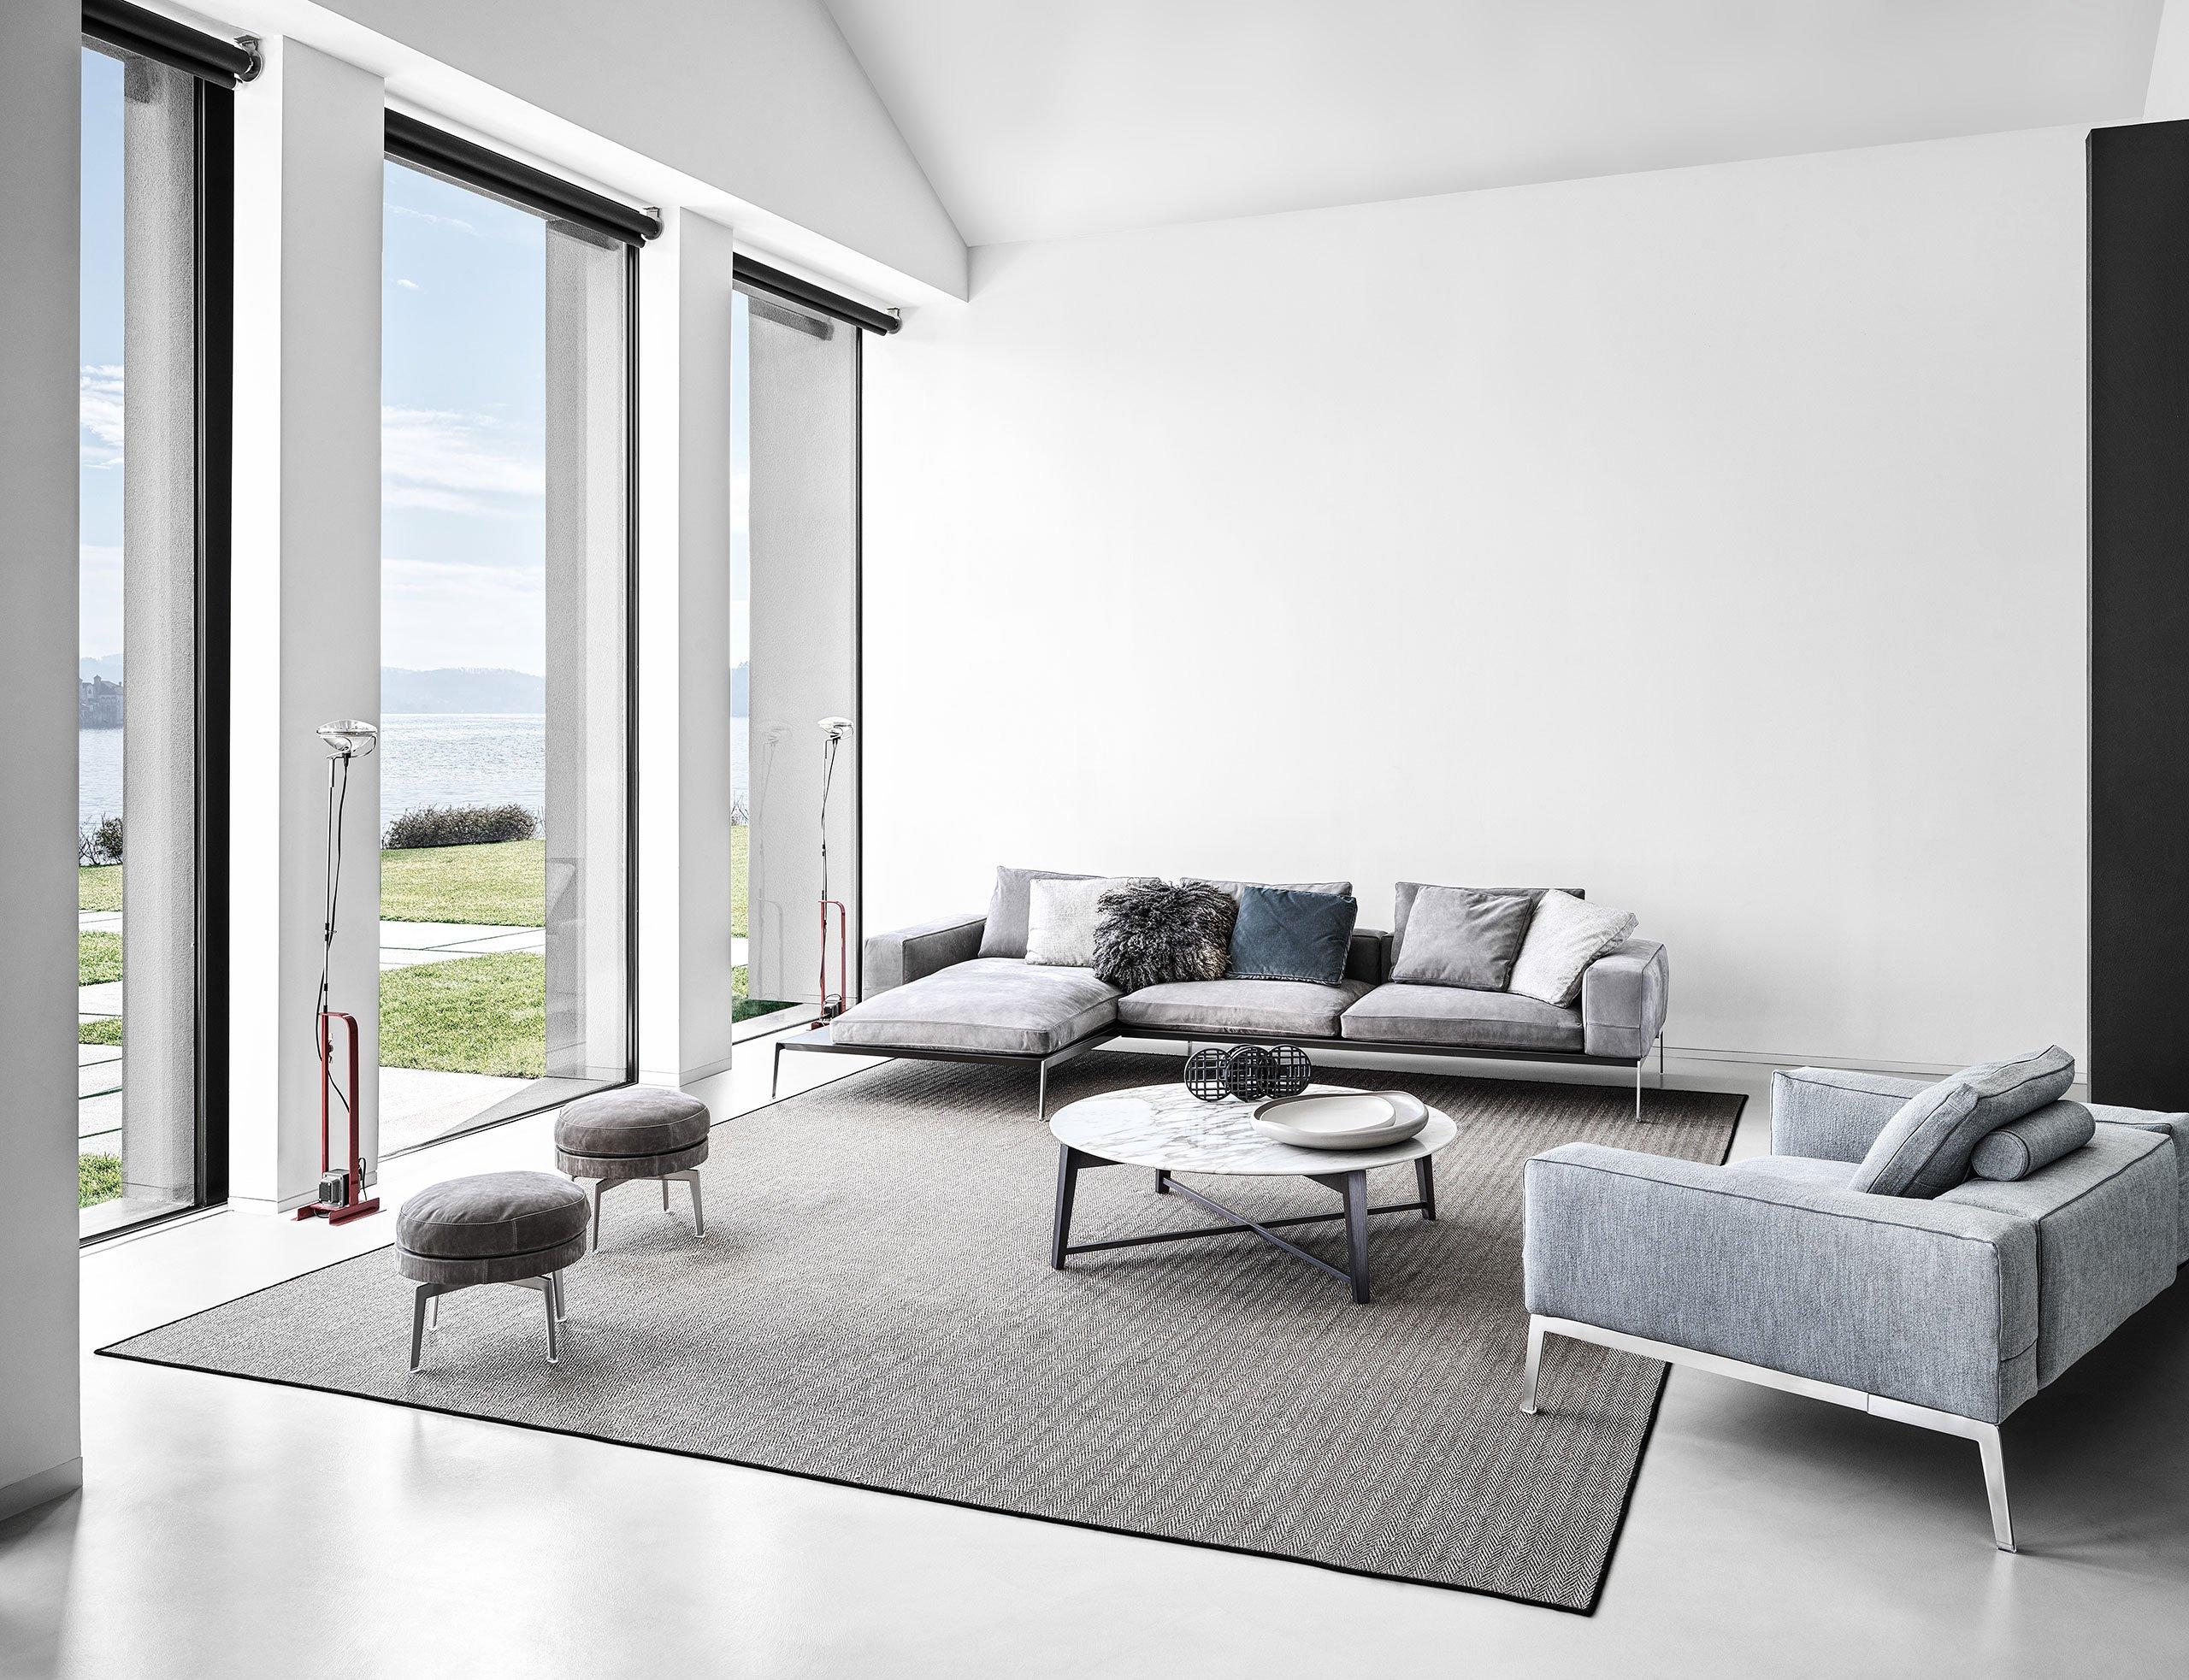 Lifesteel sofa by Antonio Citterio for Flexform. Photo© Flexform.